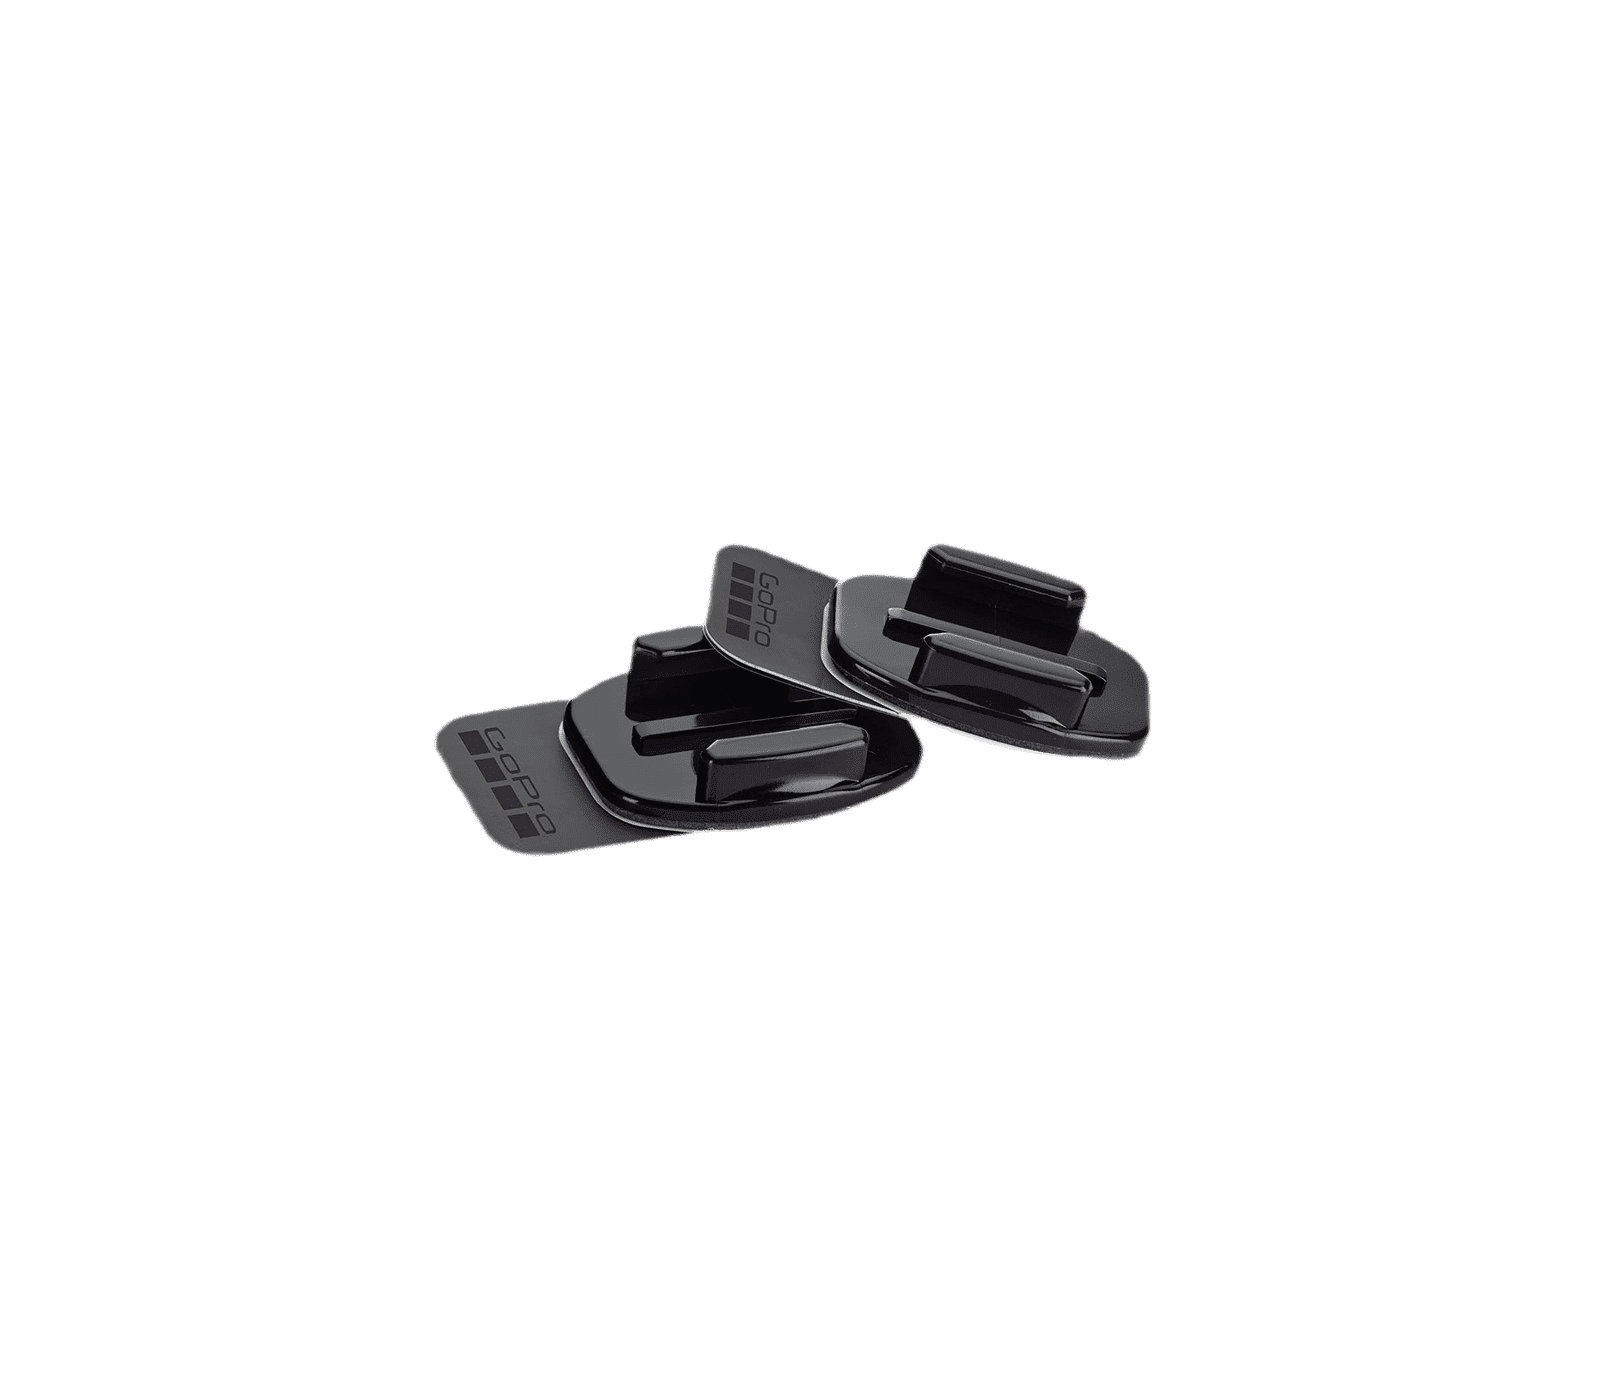 Gopro removable instrument mounts